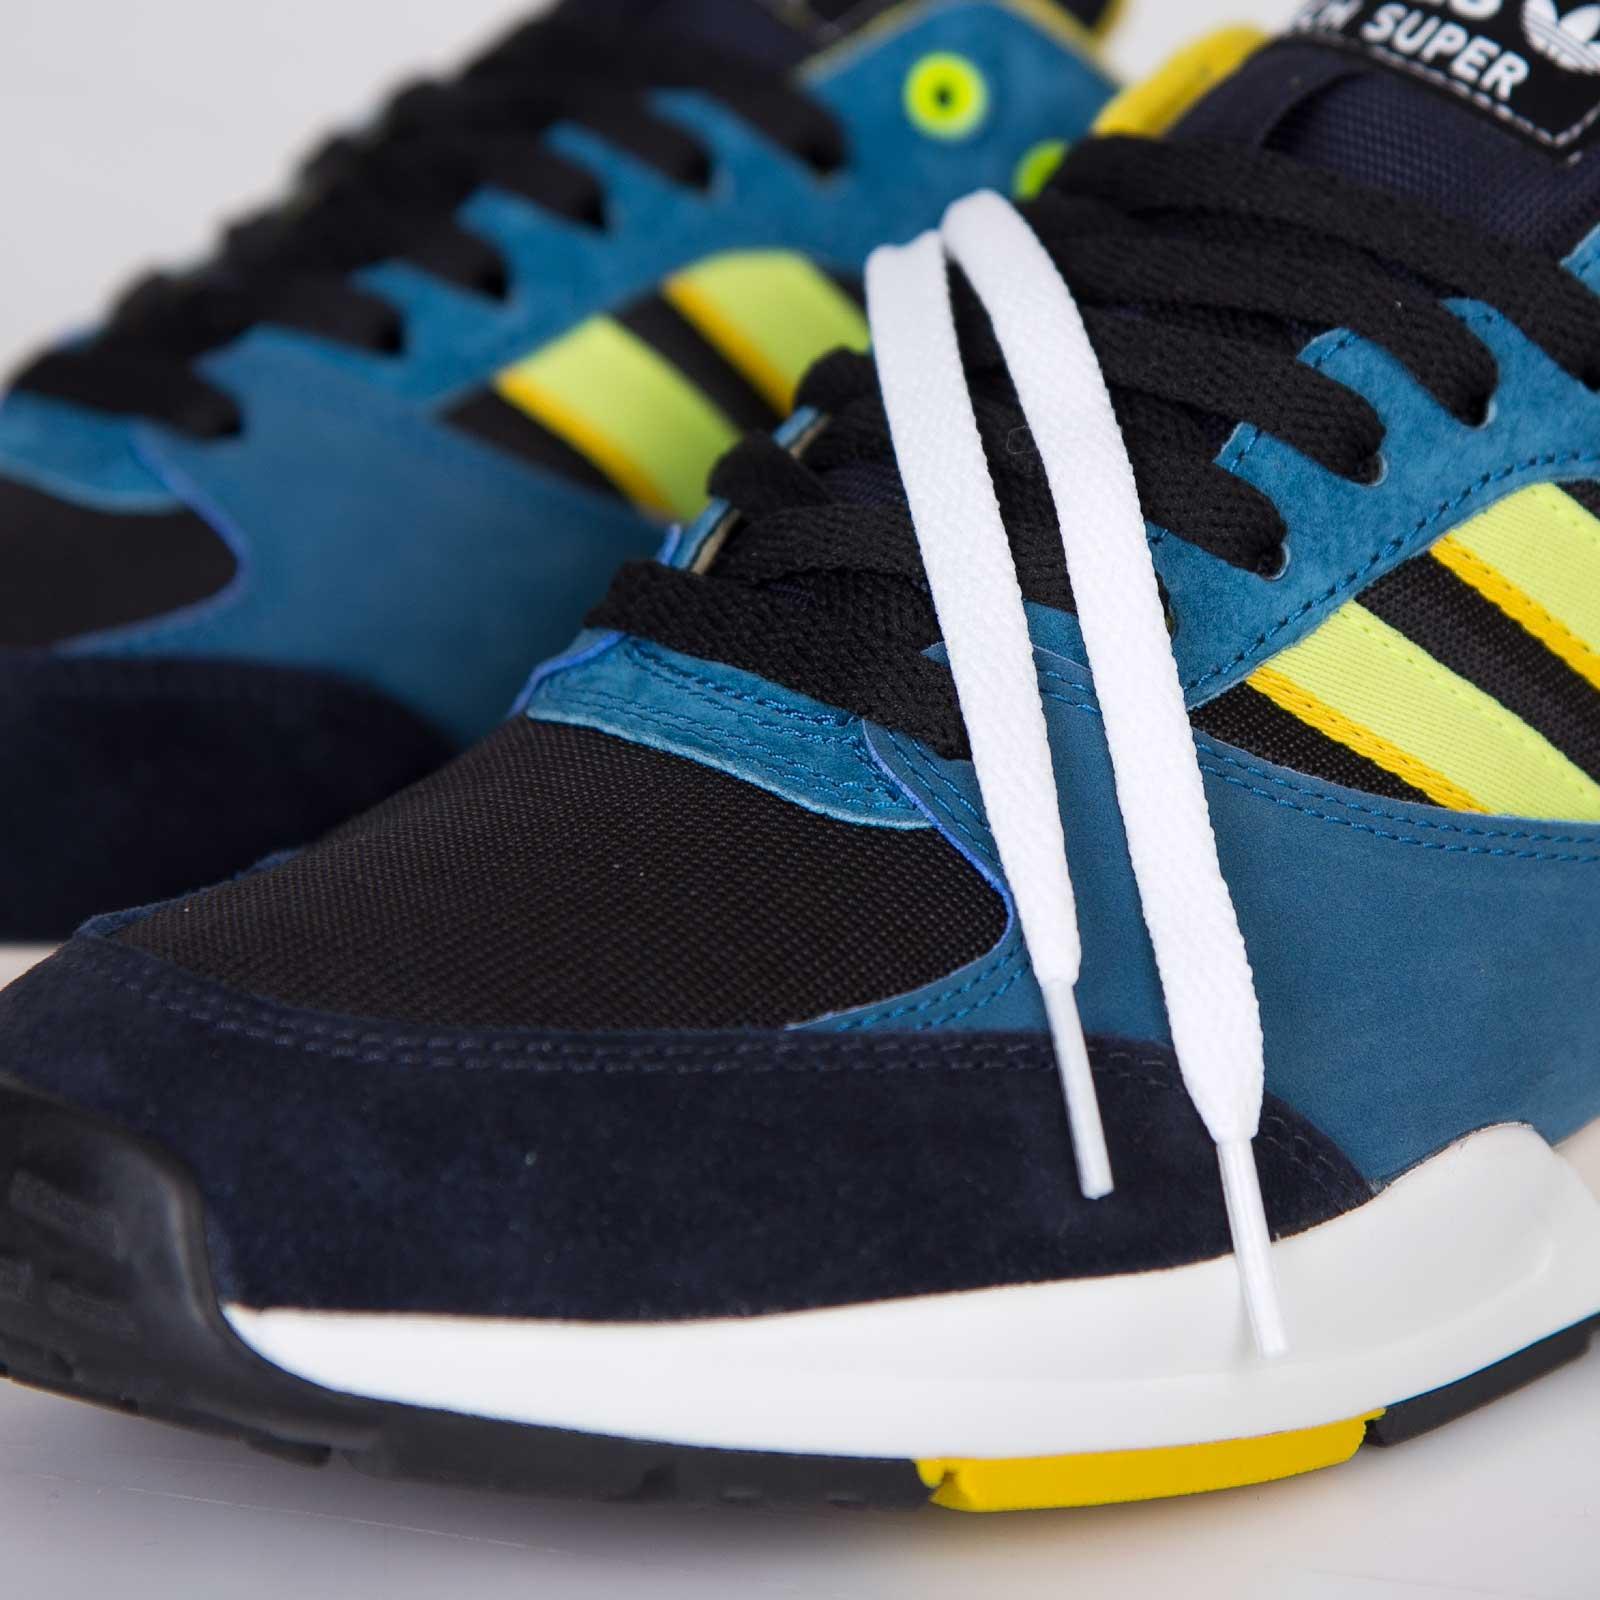 reputable site d702f d7829 ... adidas Tech Super ...